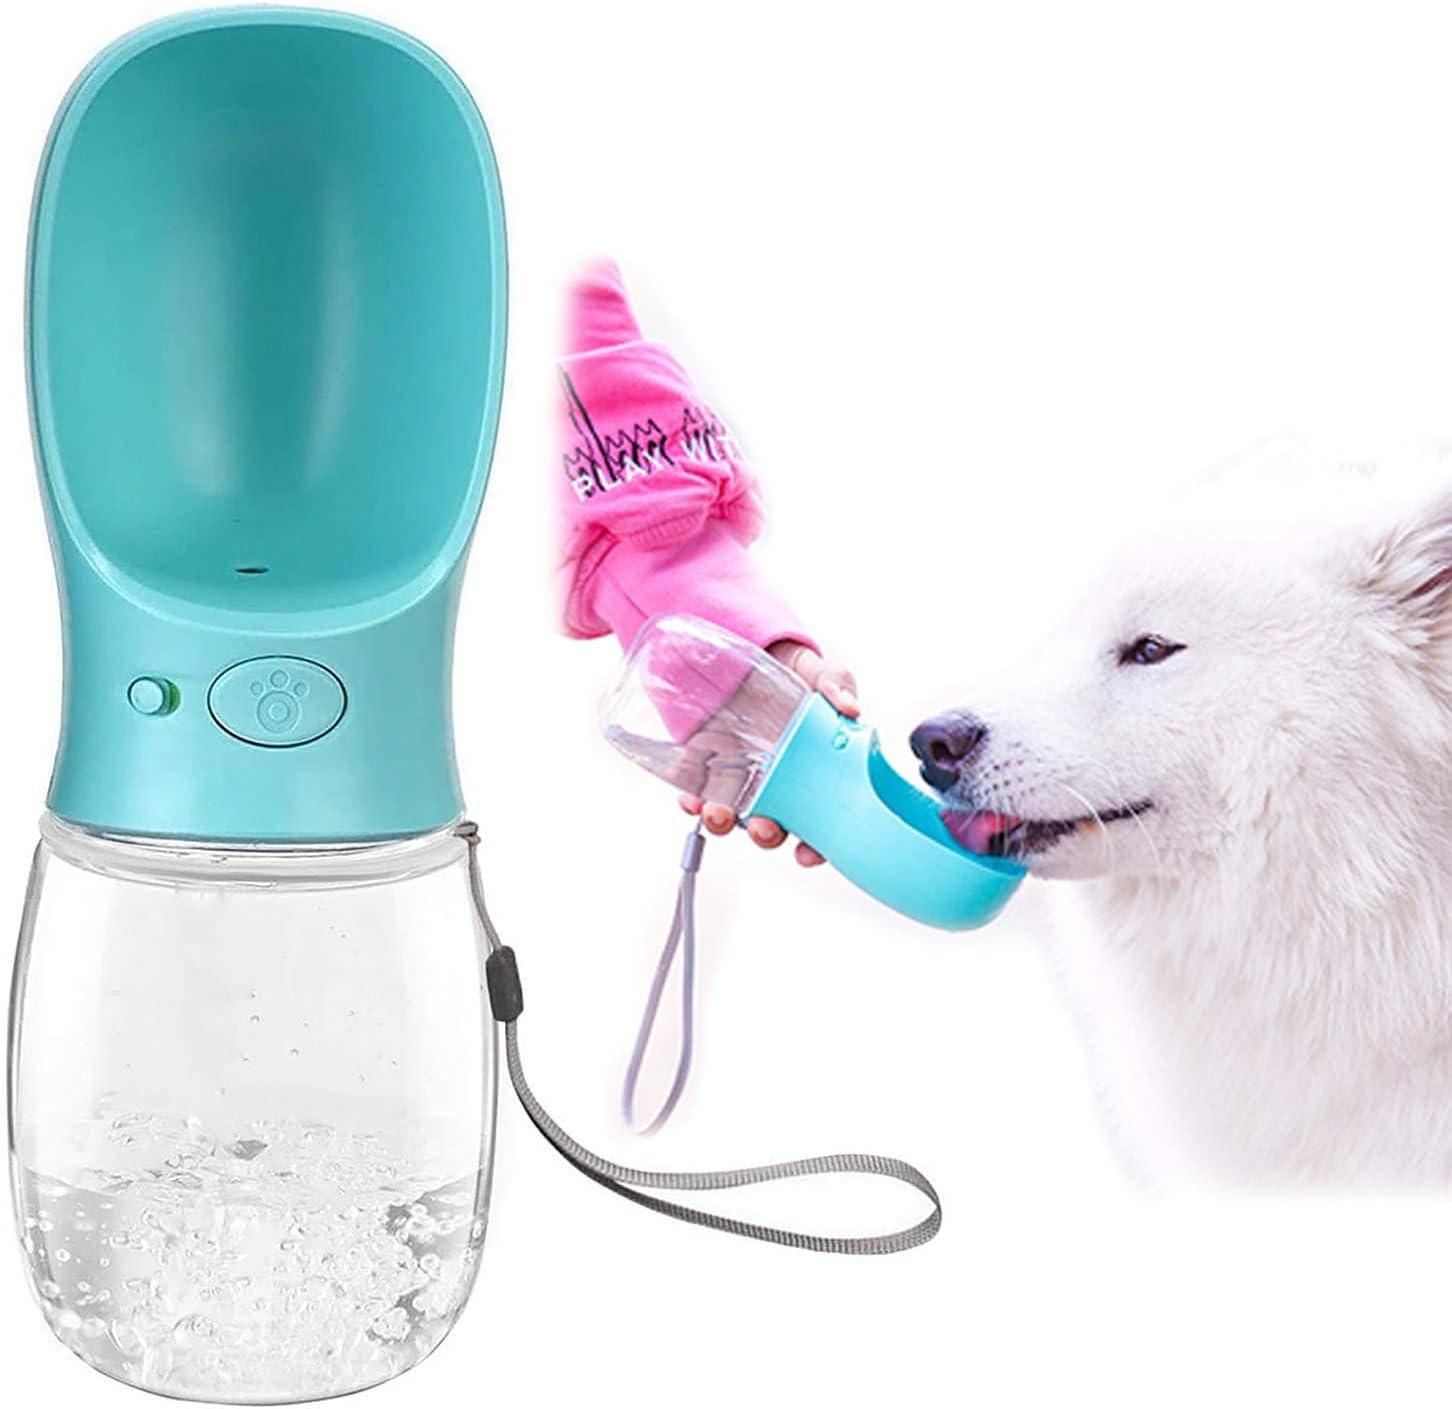 Dog Water Oklahoma City Mall Bottle Seattle Mall Leak Proof Dispenser Dogs Portable Ligh